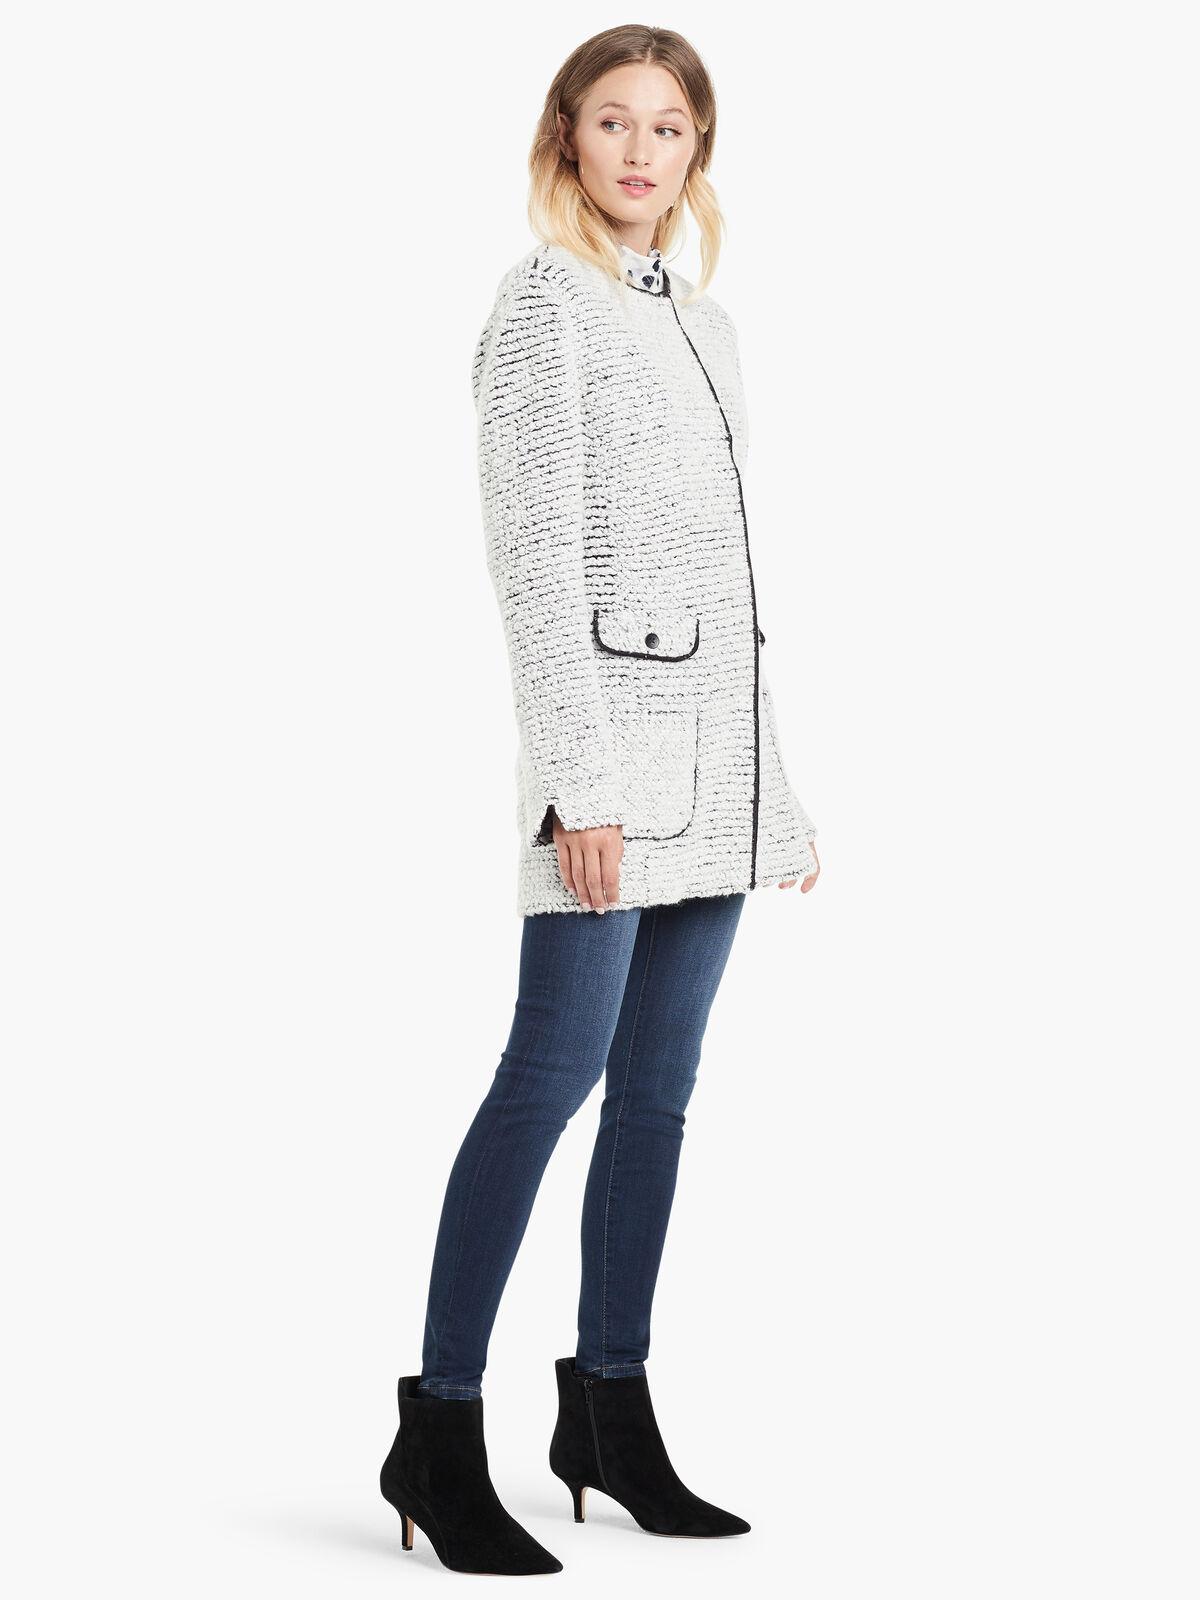 Snow Leopard Jacket